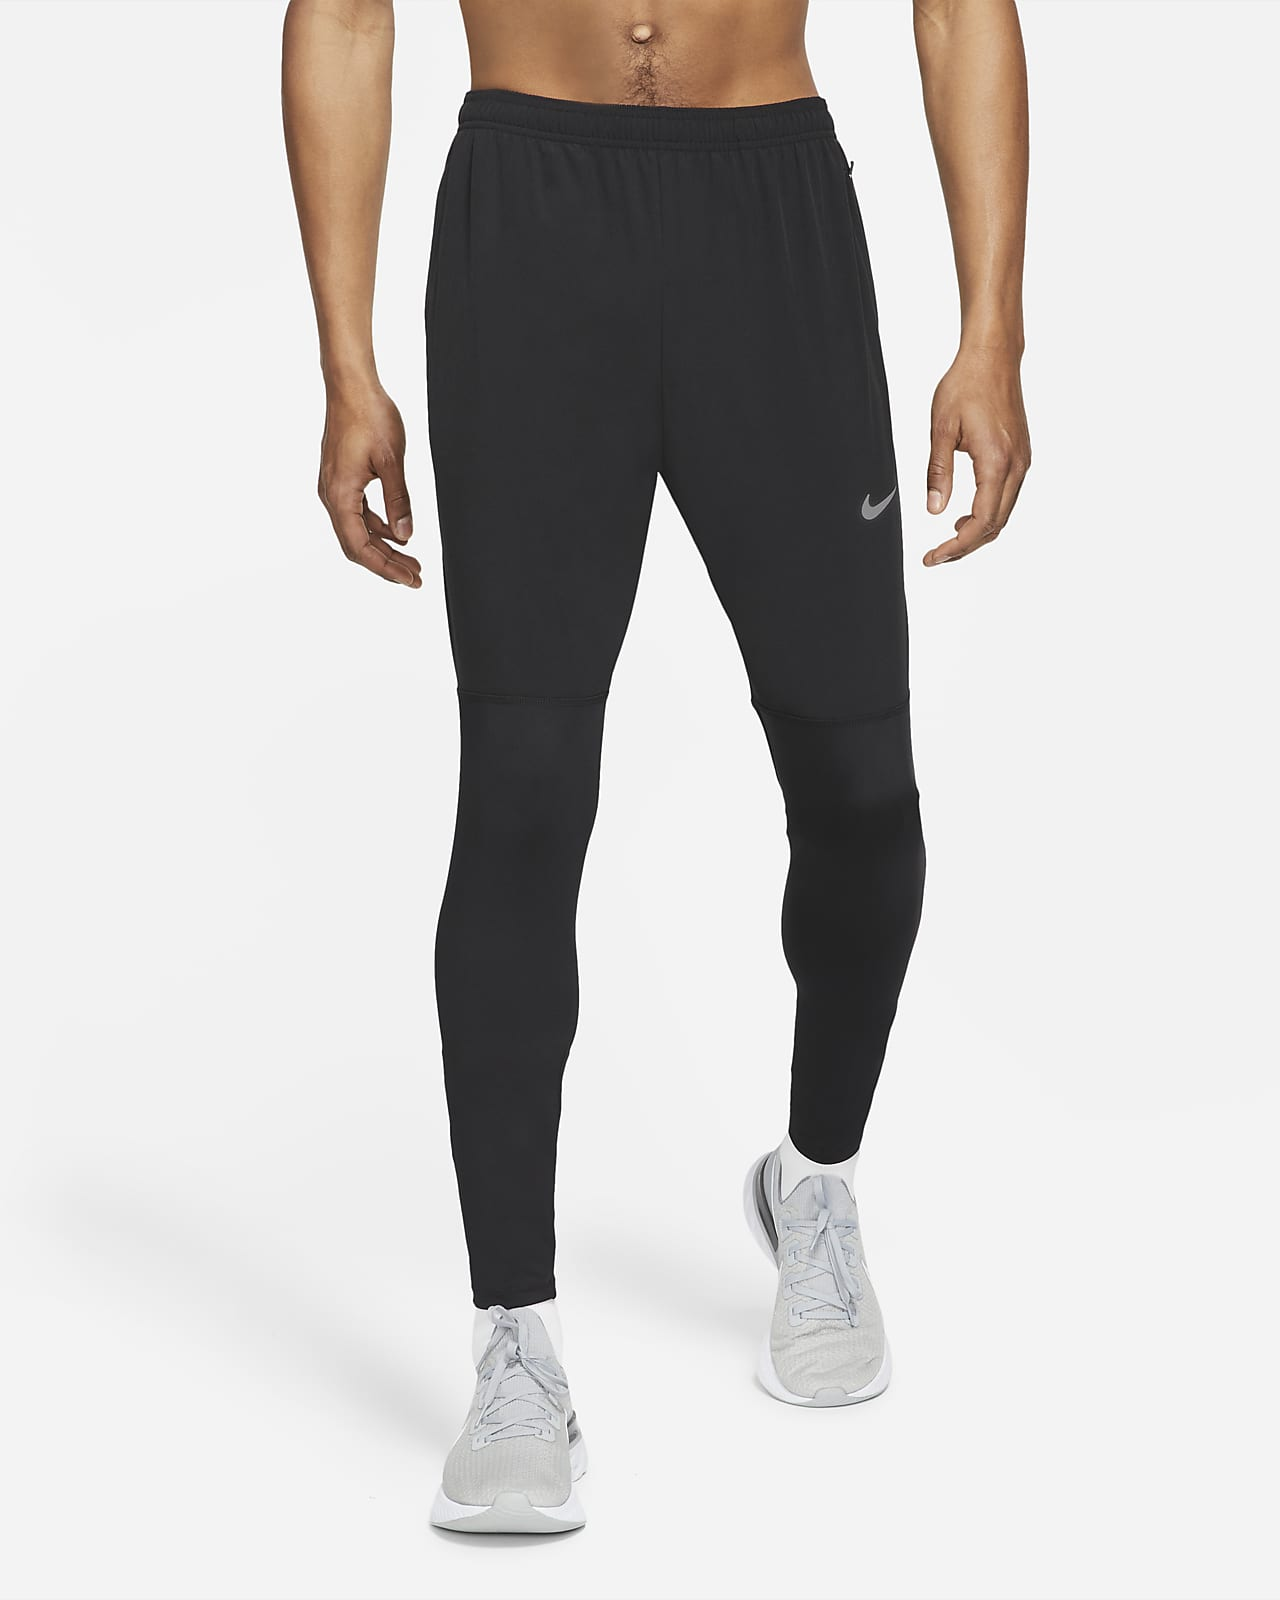 Nike Dri-FIT UV Challenger Dokuma Hibrit Erkek Koşu Eşofman Altı